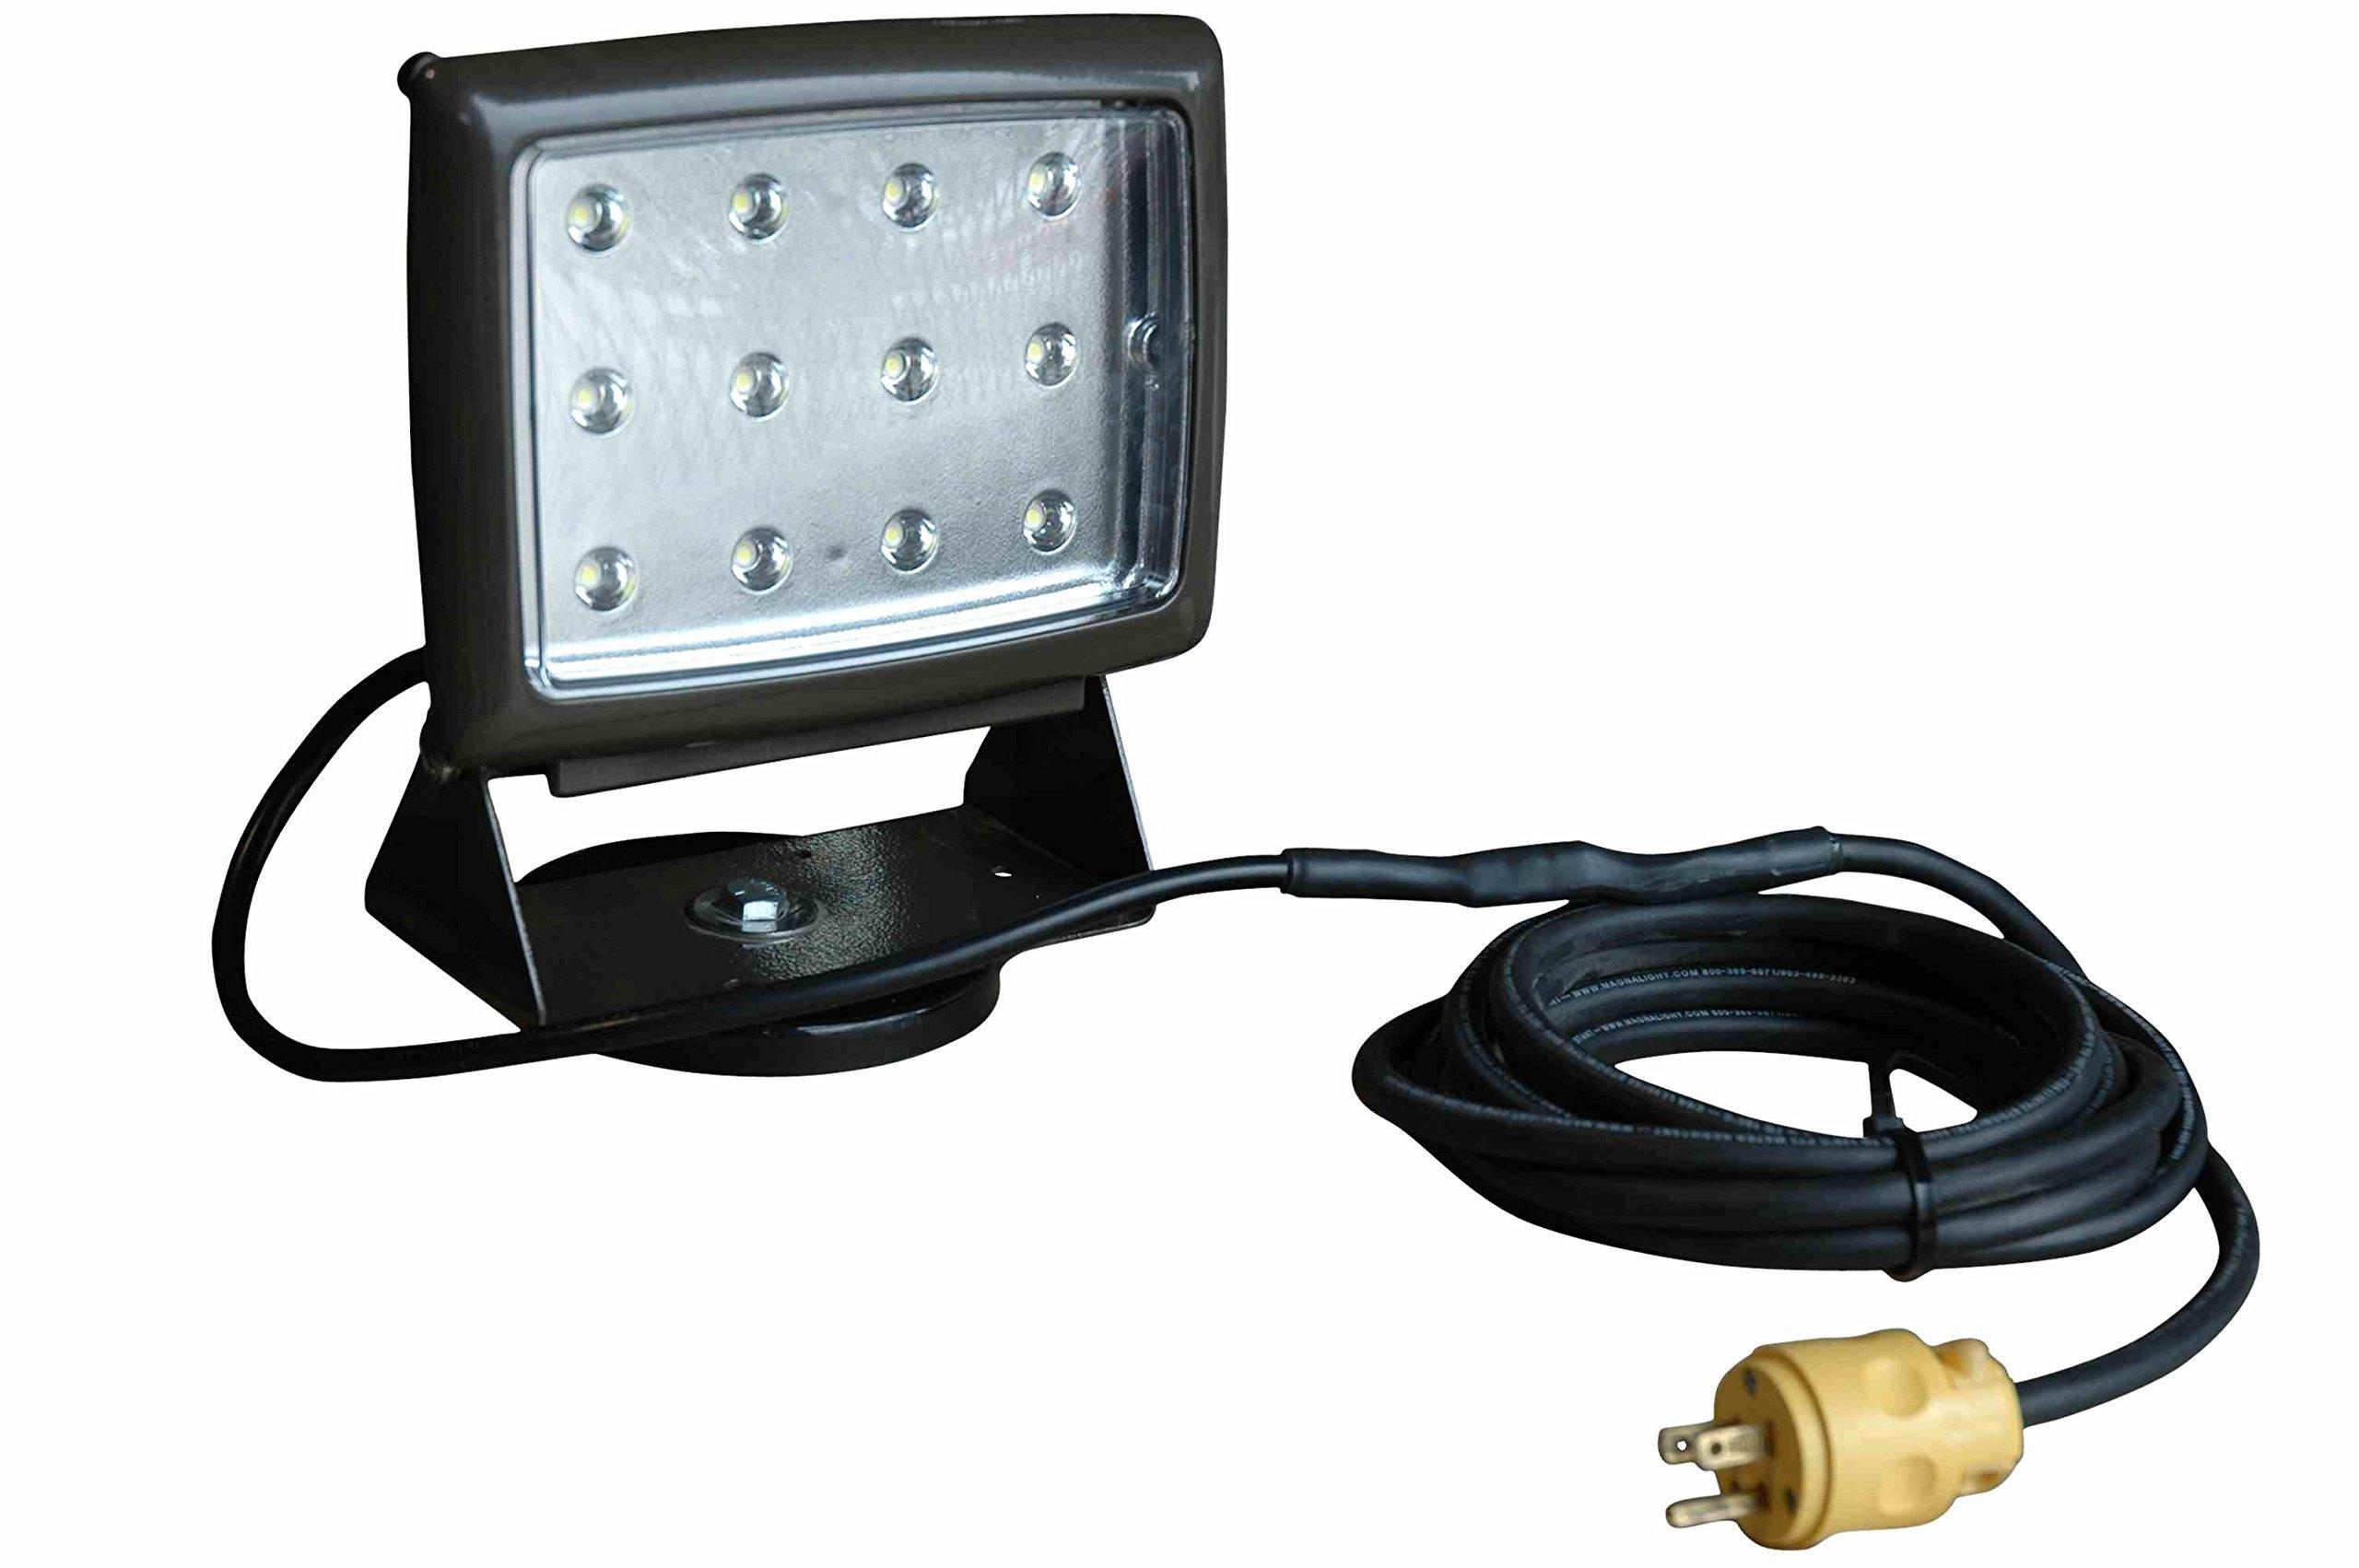 Larson Electronics AML-LED-WP40-M-Brnz High Intensity LED Automotive Mechanics' Work Light with 200lb. Grip Magnetic Base - 120V AC (Bronze)